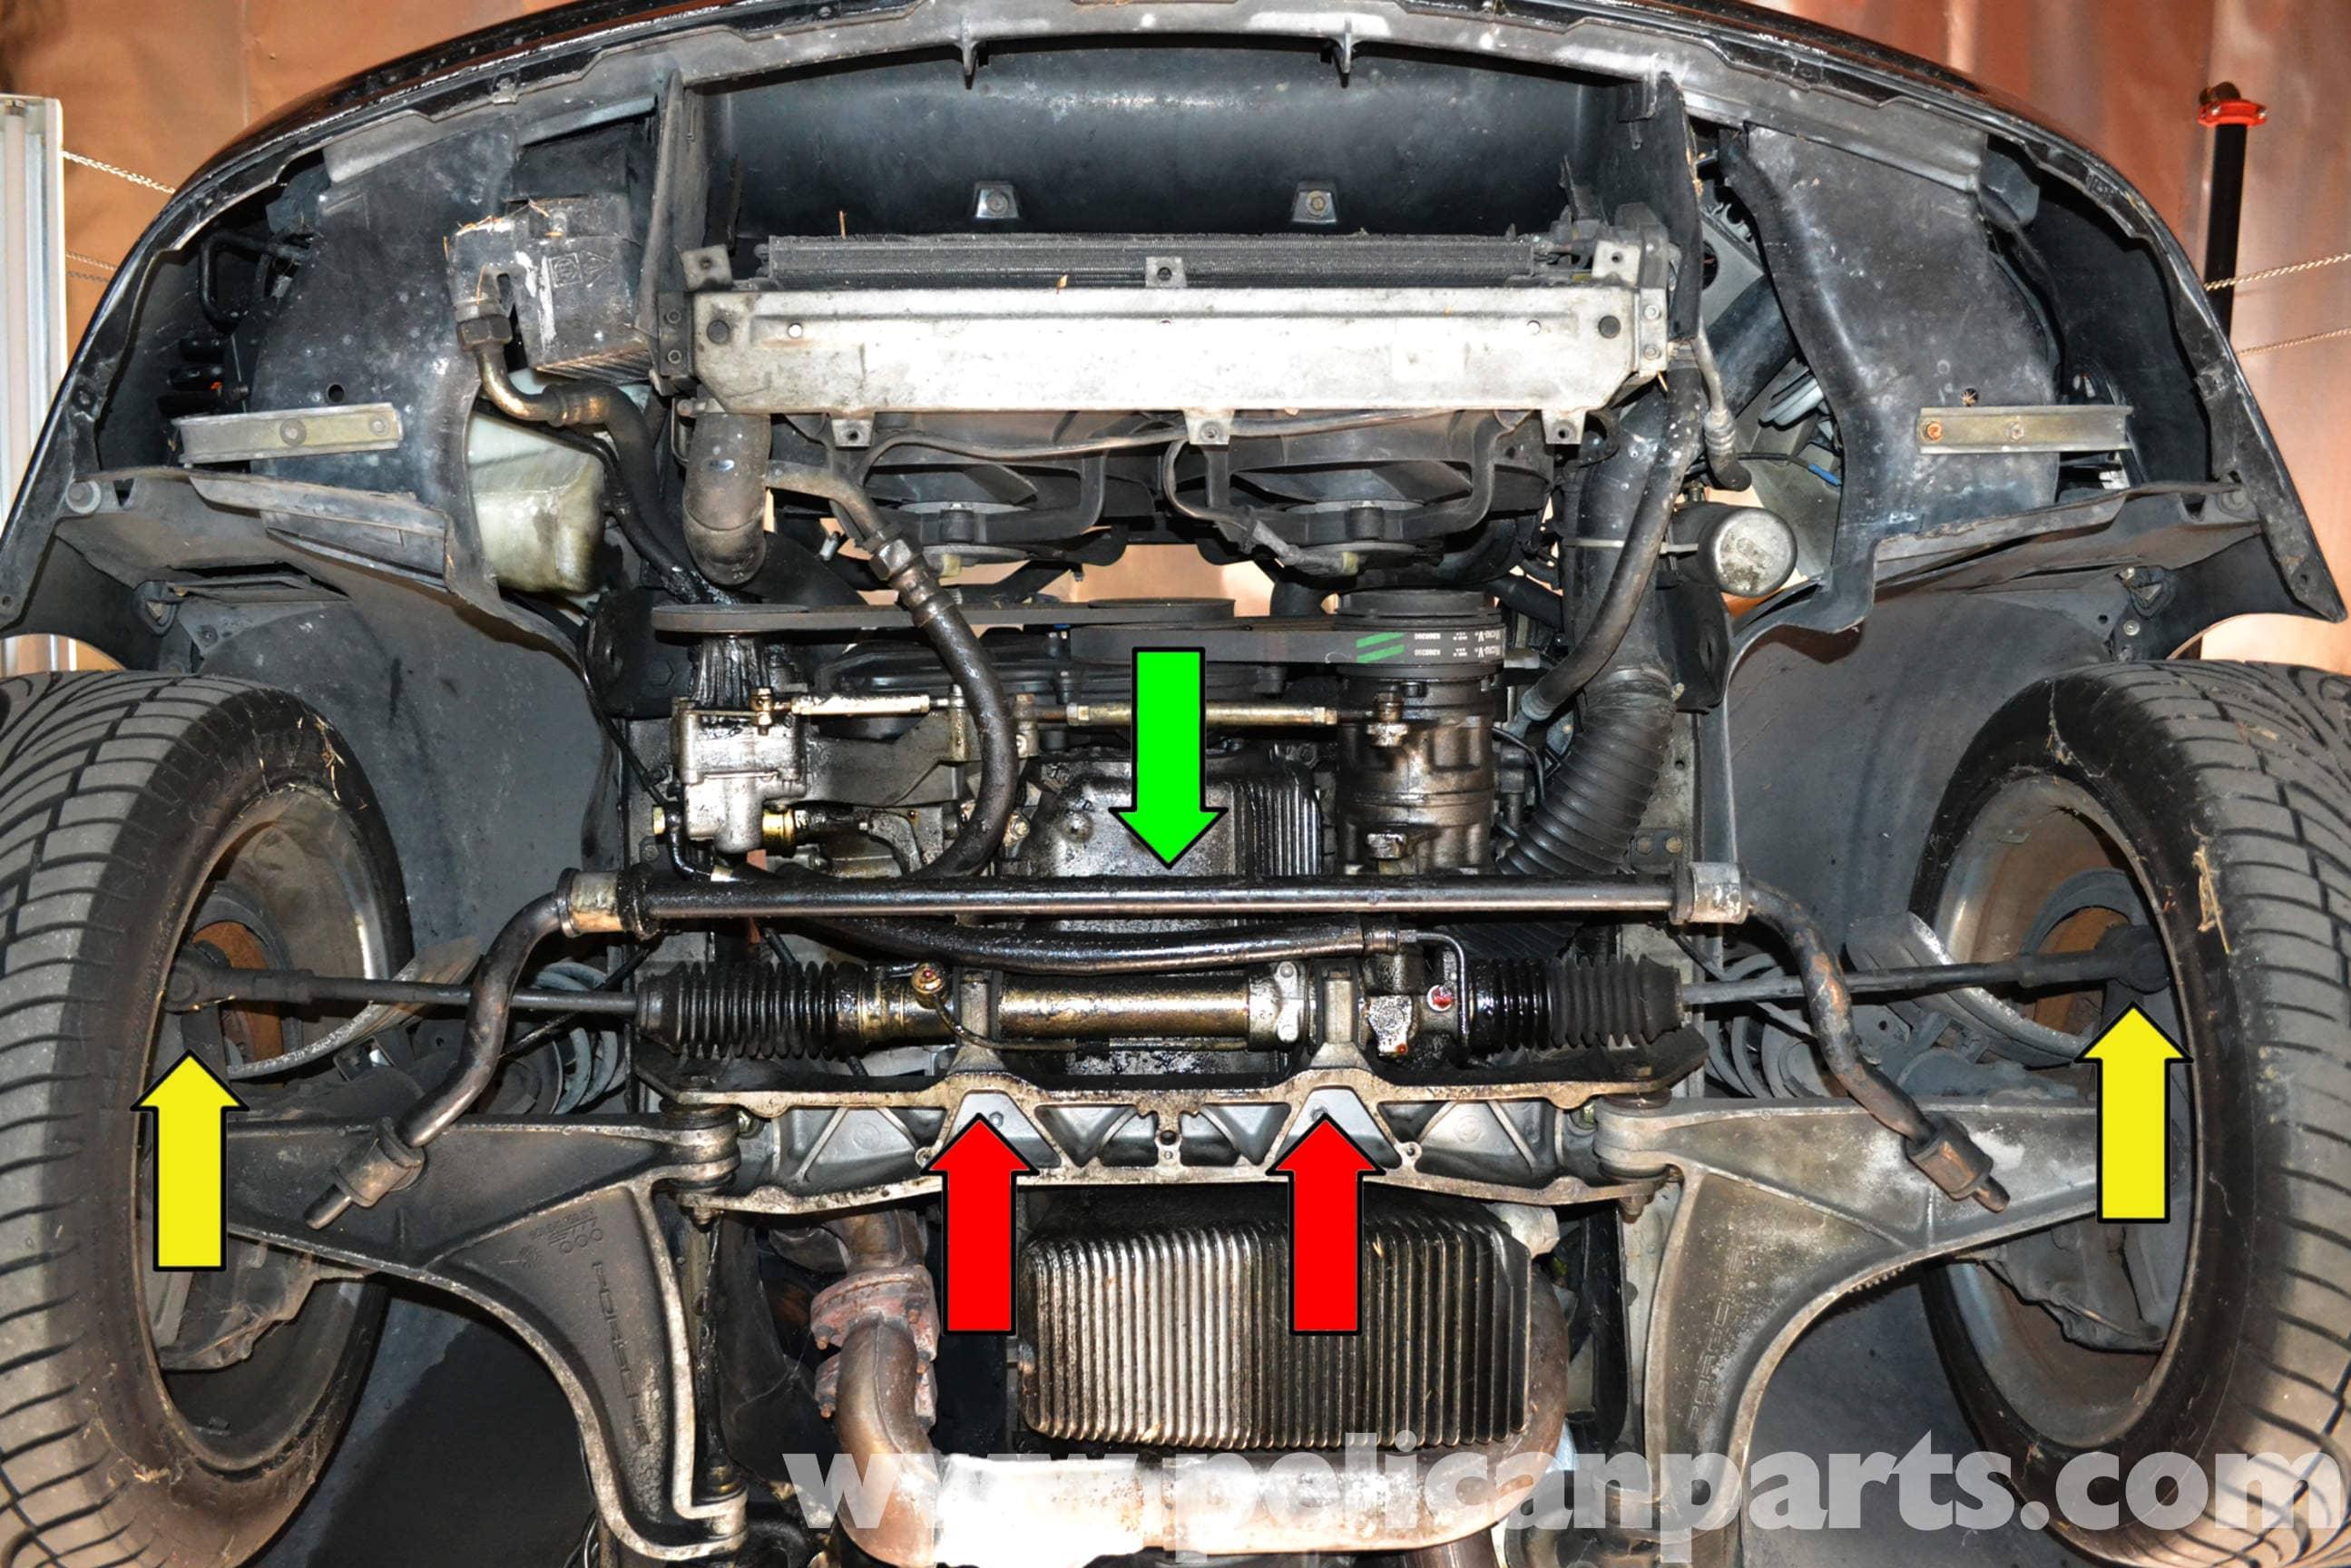 porsche 997 engine diagram    porsche    944 steering rack removal  1986 1991  pelican     porsche    944 steering rack removal  1986 1991  pelican